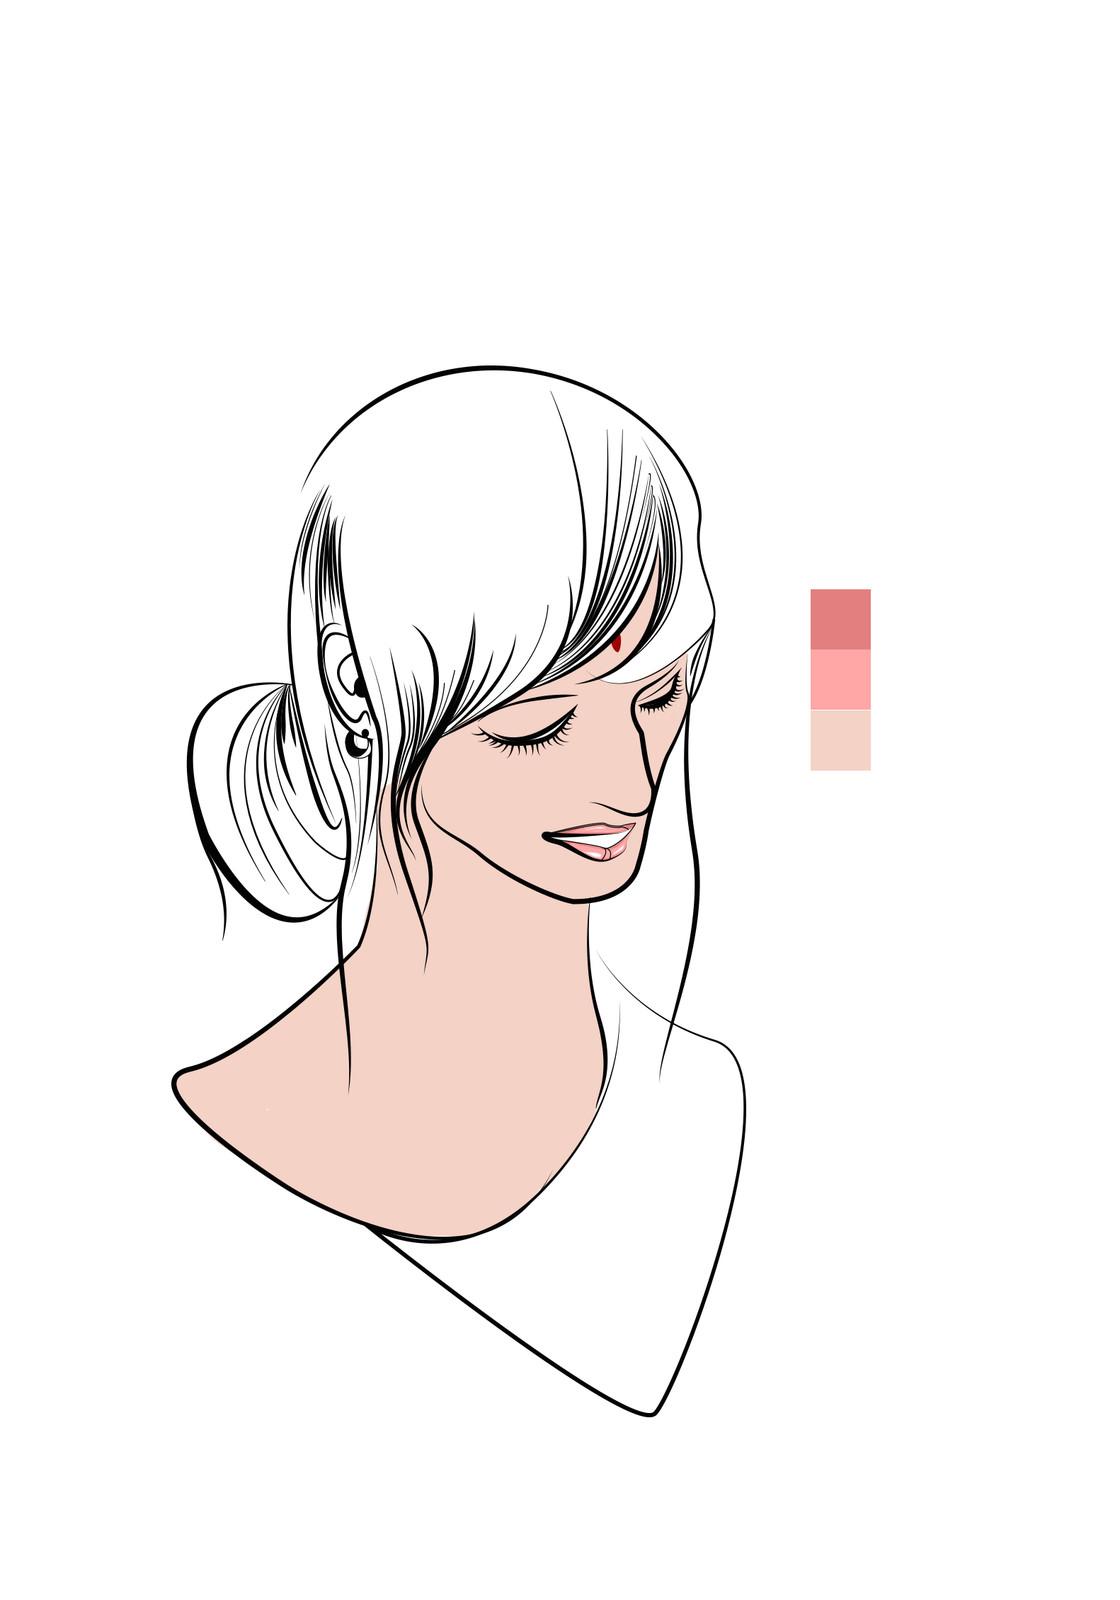 five- Base coloring(Skin)